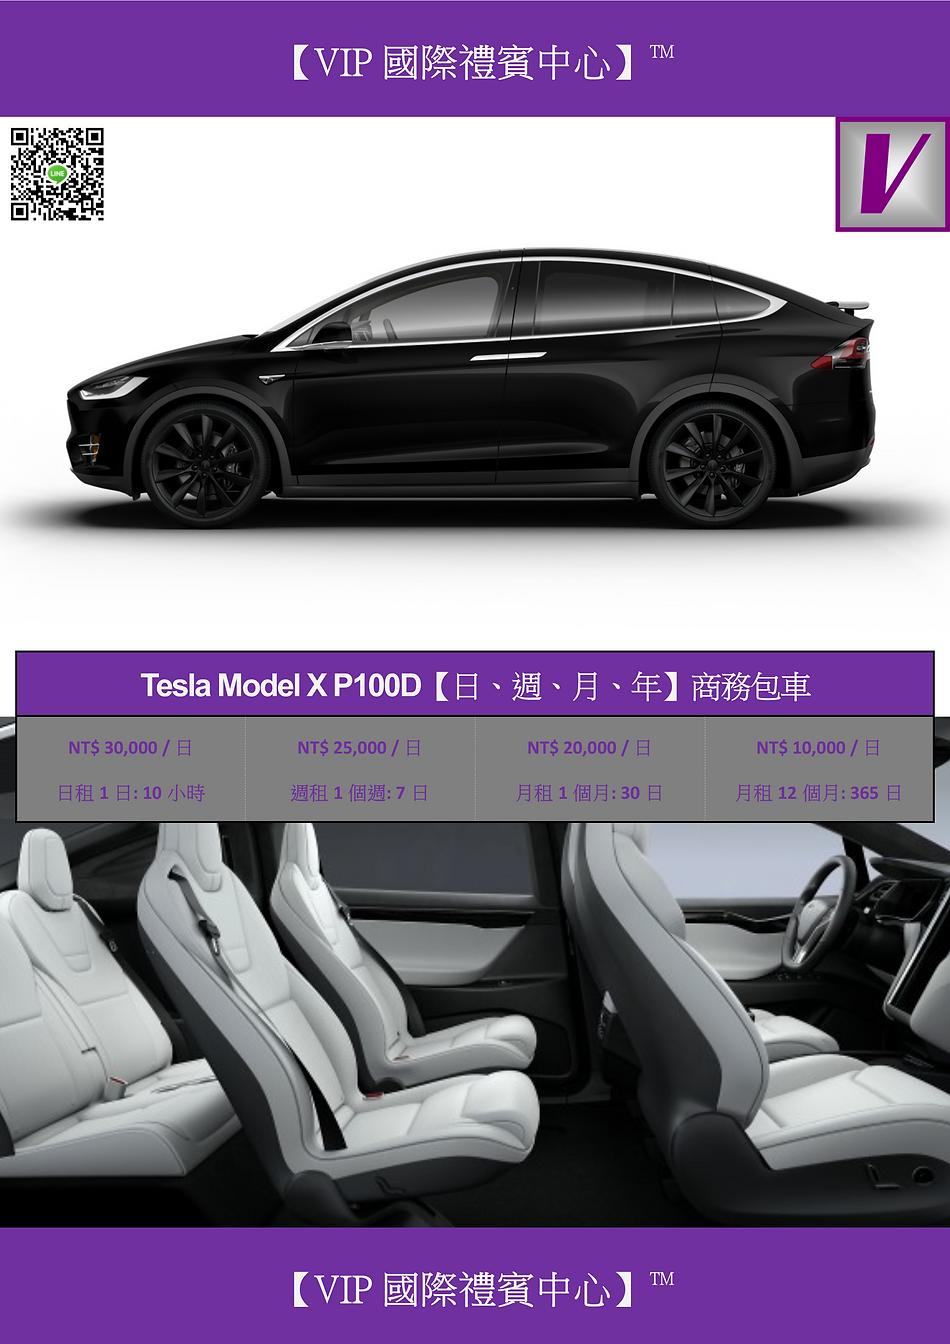 VIP國際禮賓中心 TESLA MODEL X P100D 中國臺灣接送包車